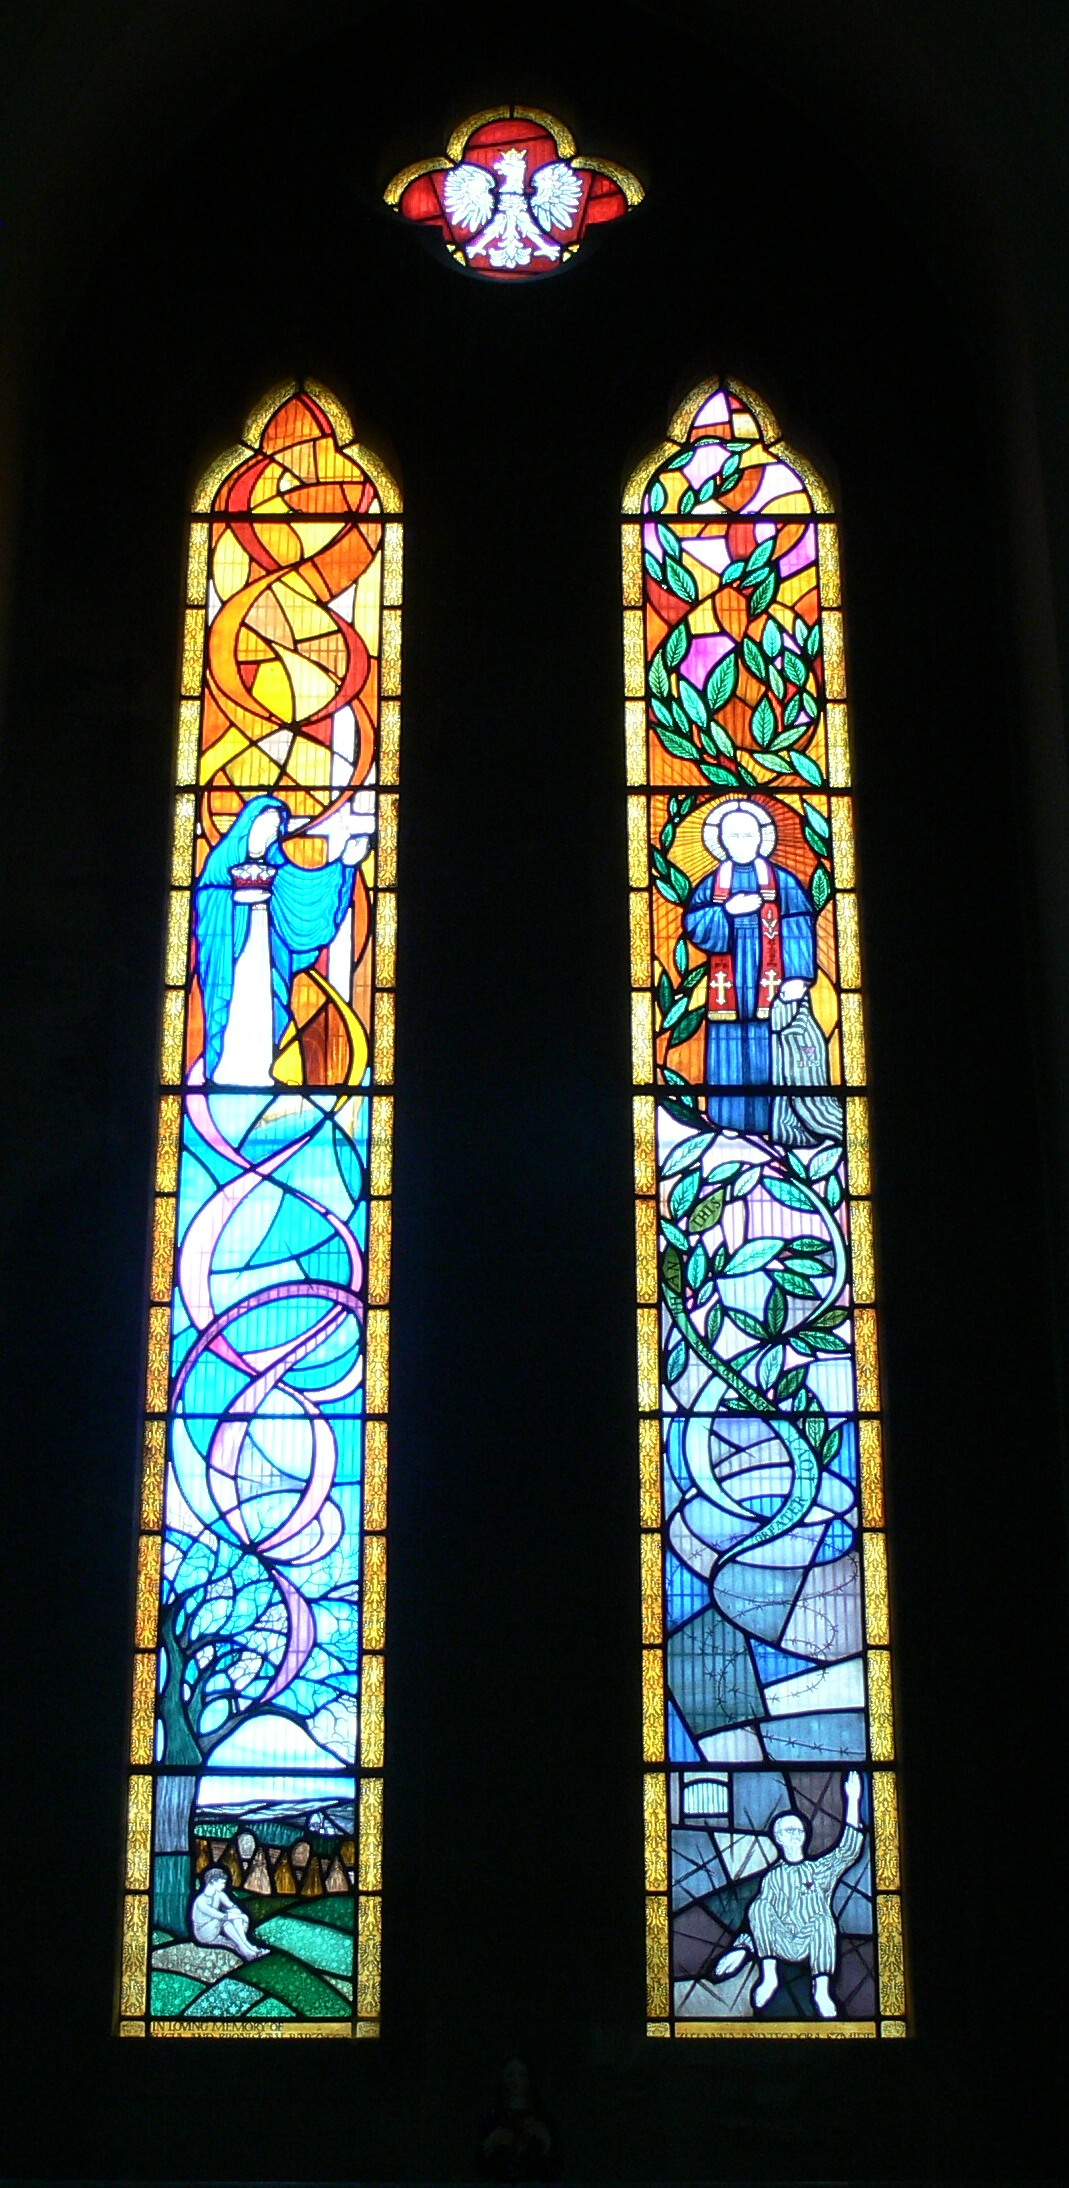 1 St Peter's Church 079